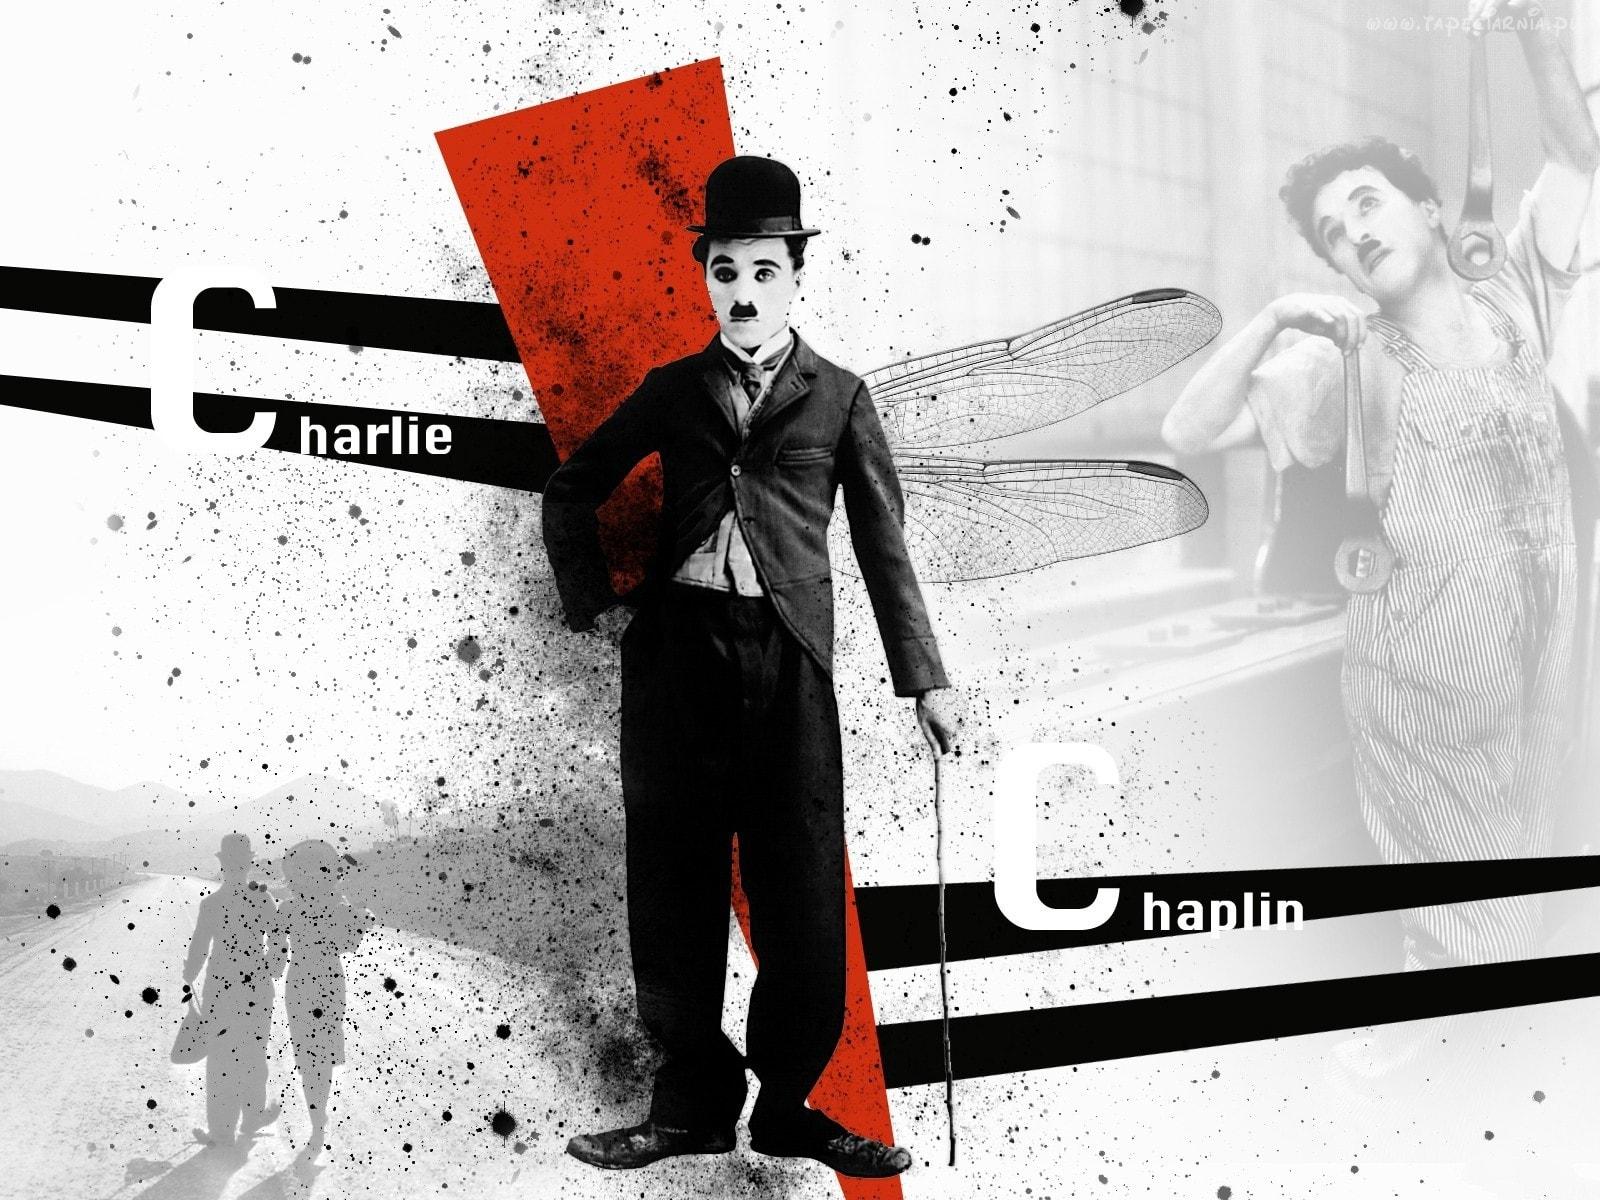 Charles Chaplin Widescreen